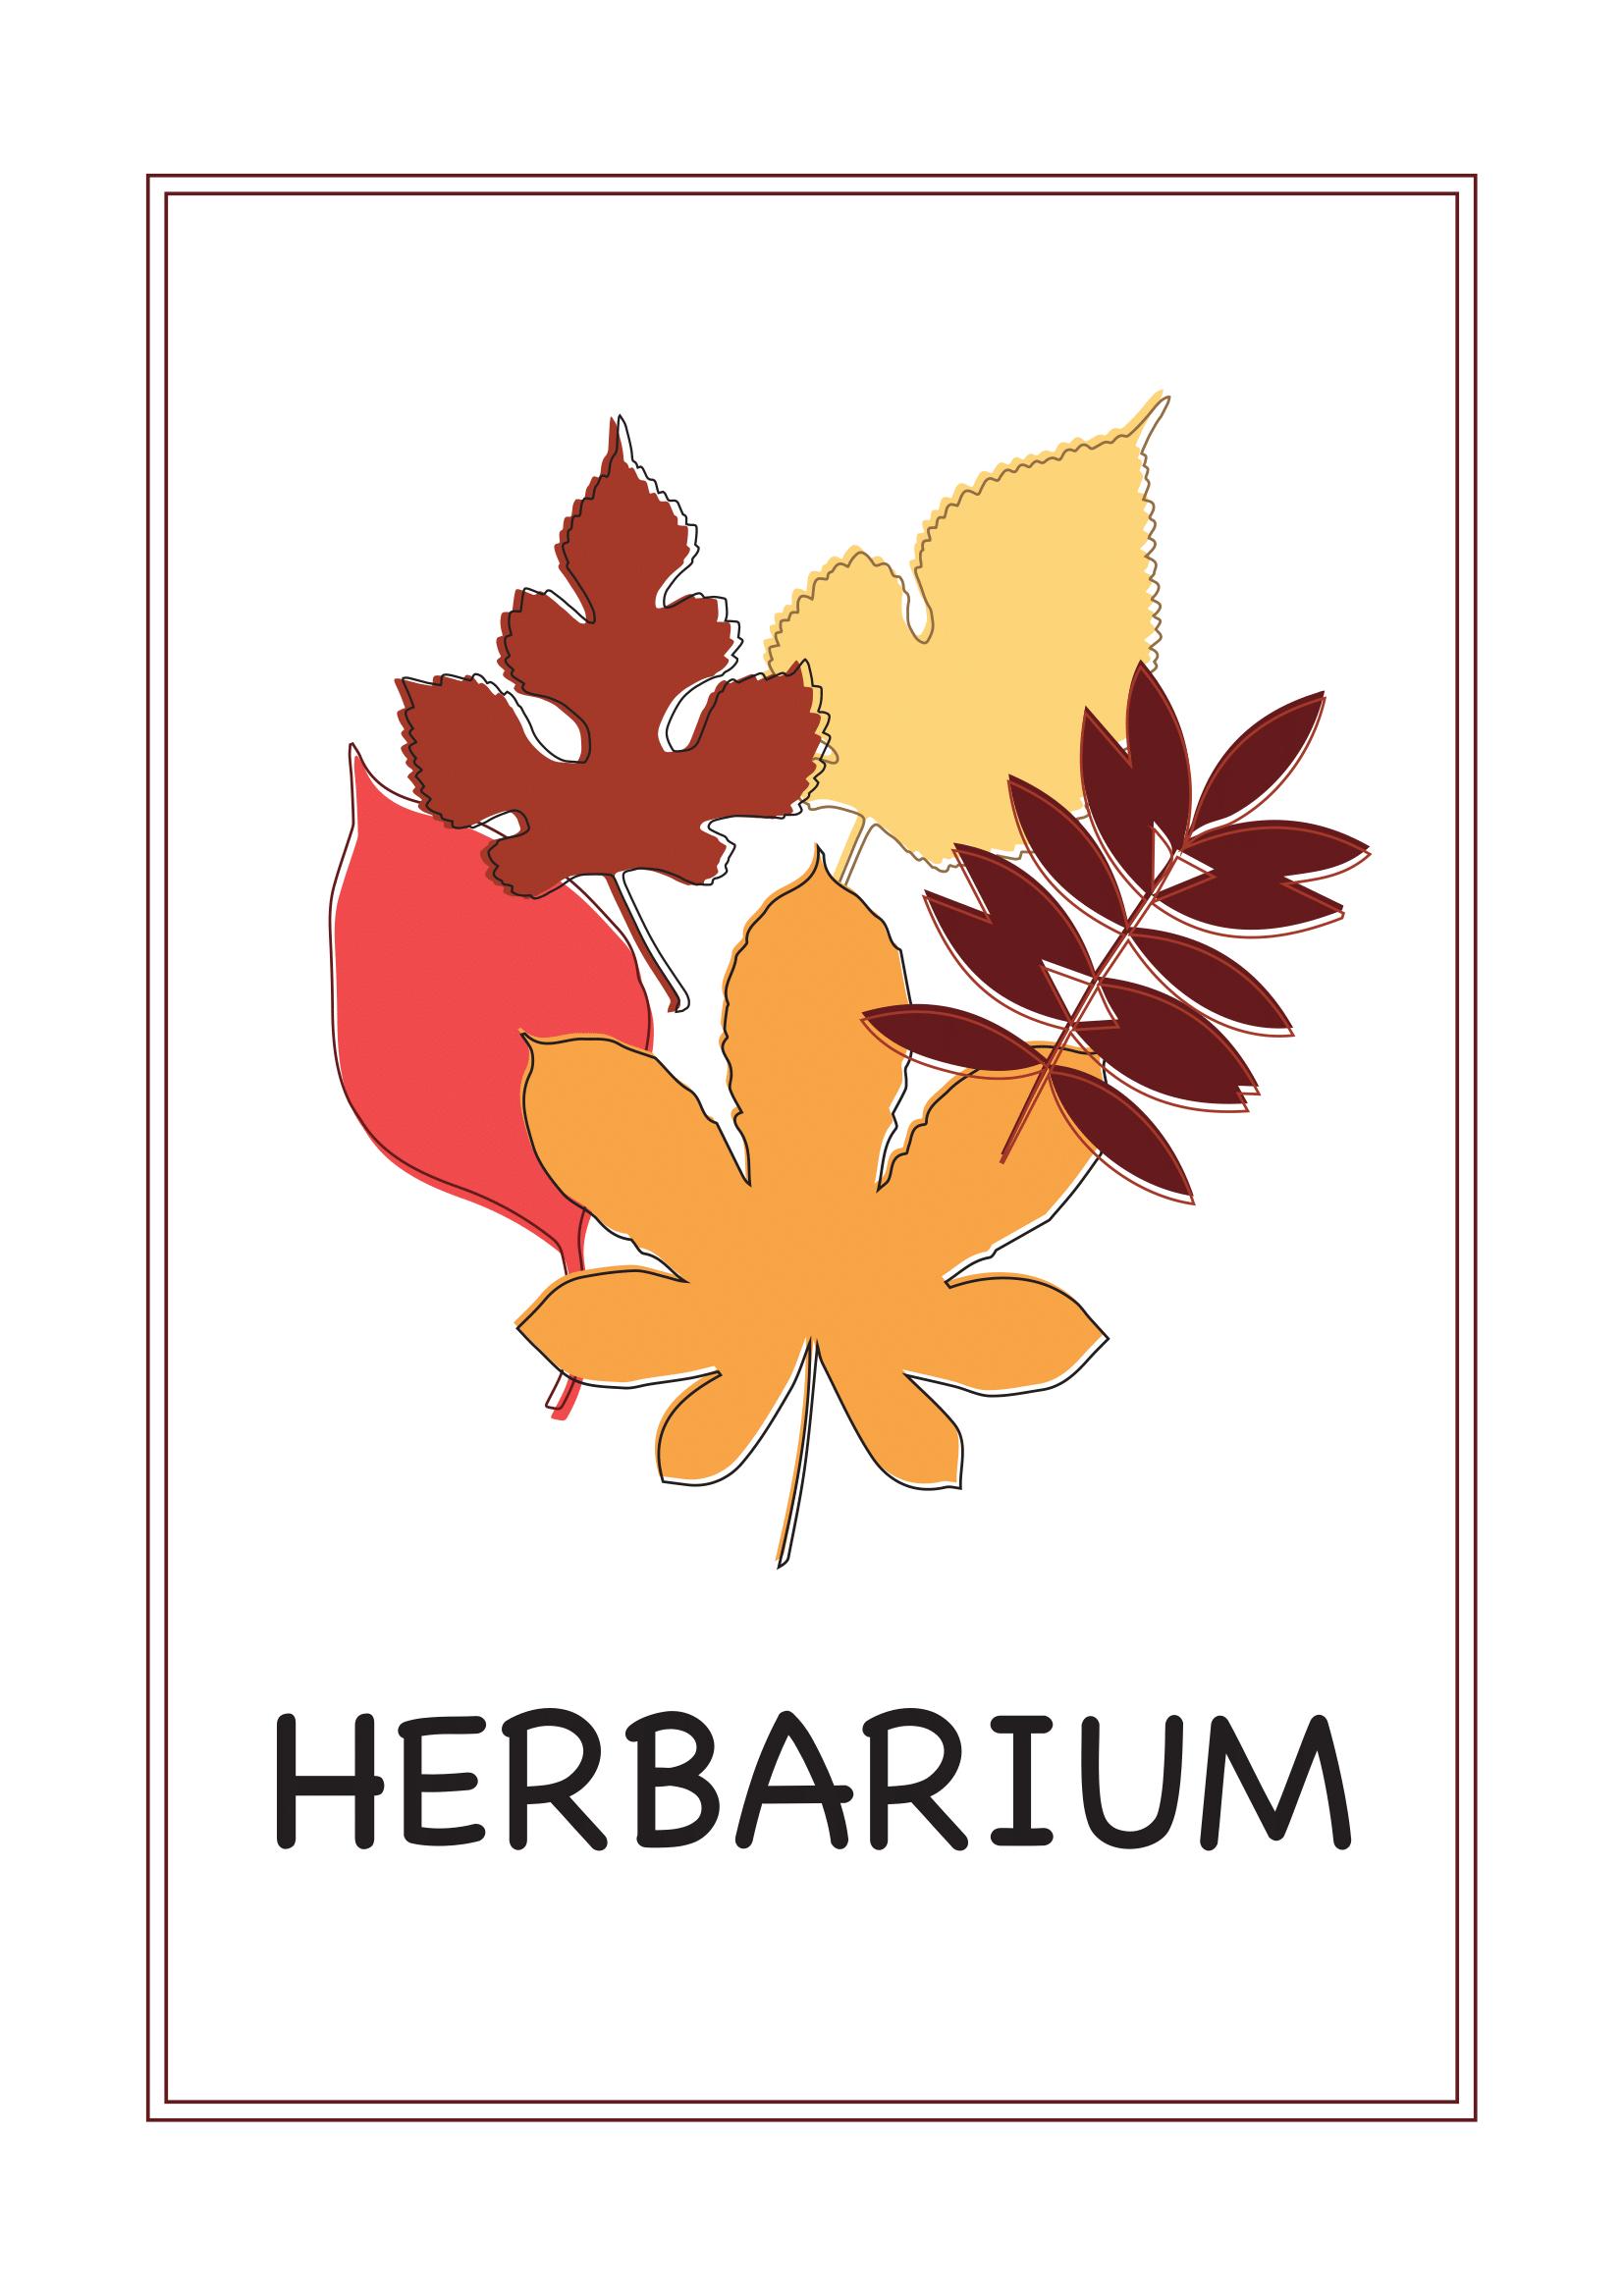 Deckblatt Herbarium 4 Deckblatt Herbarium Vorlage Deckblatt Schule